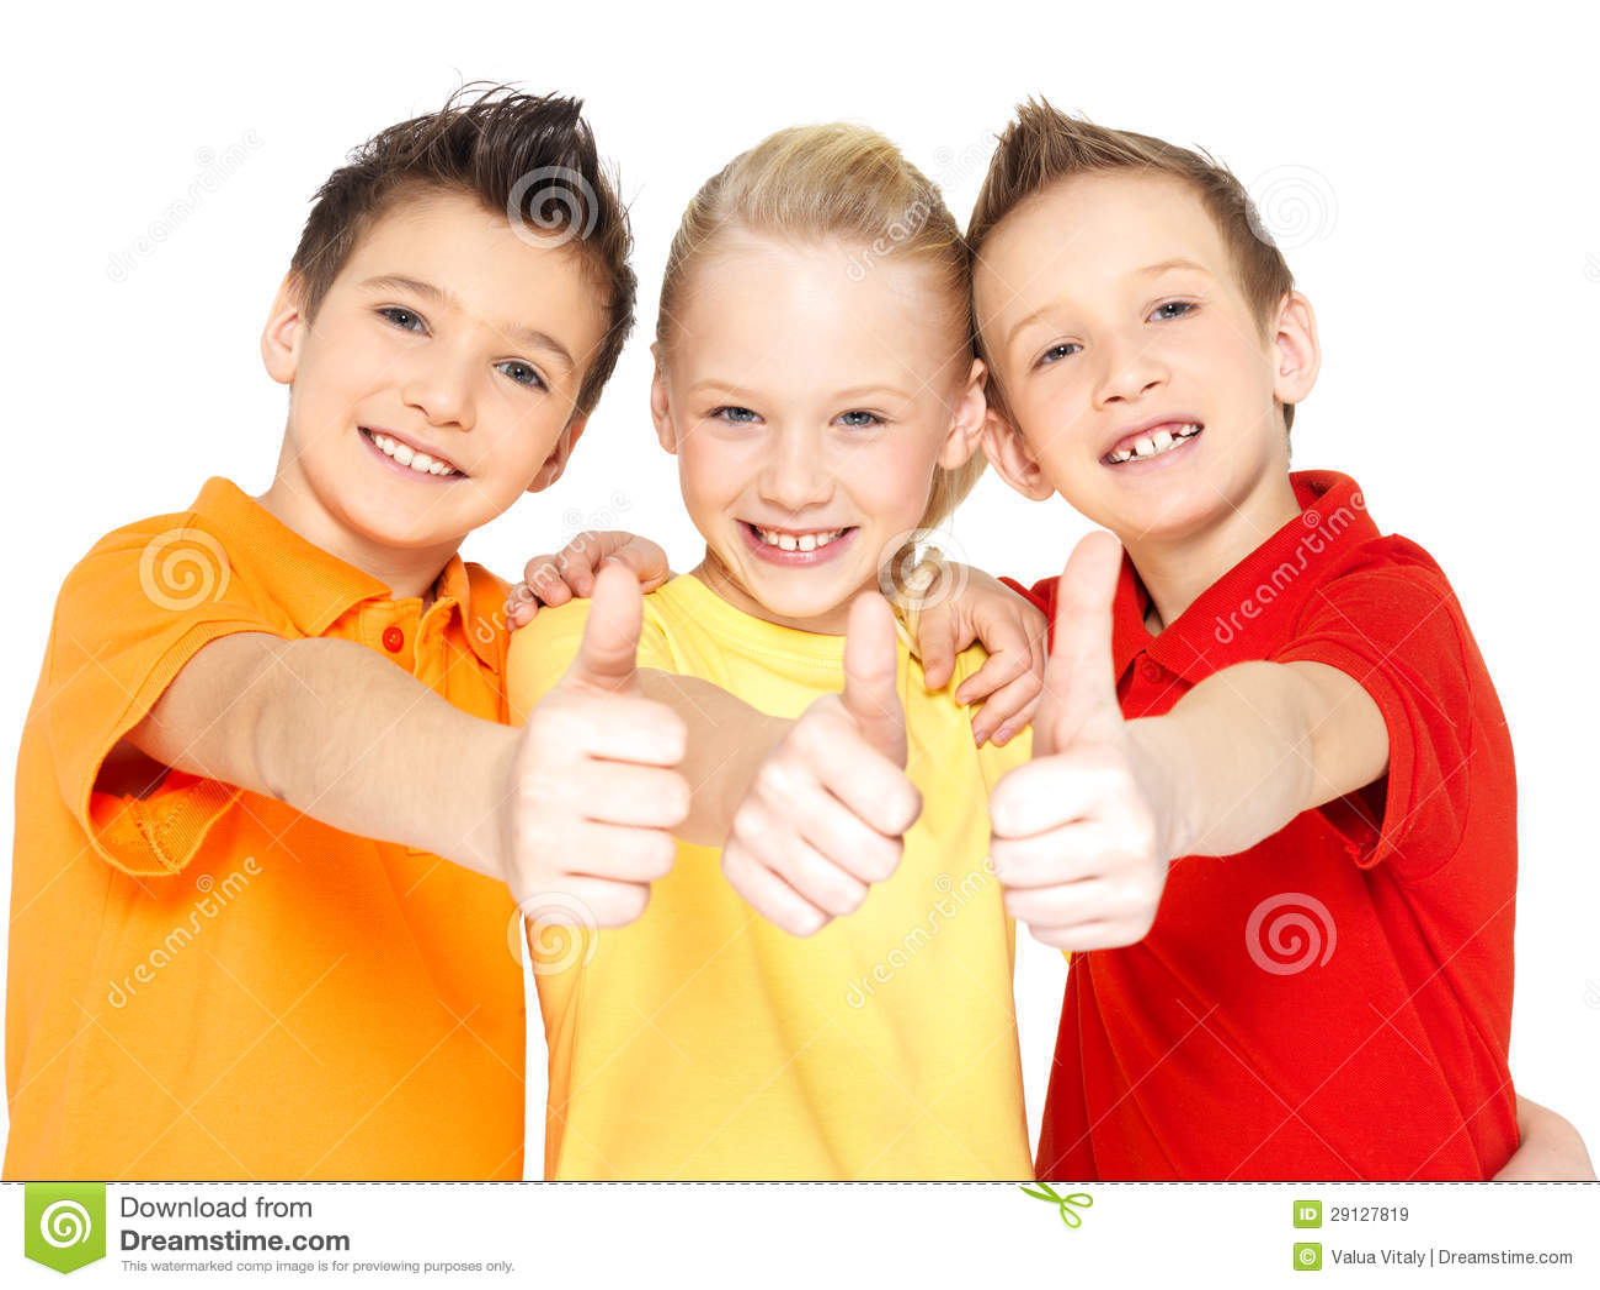 Happy children with thumbs up gesture